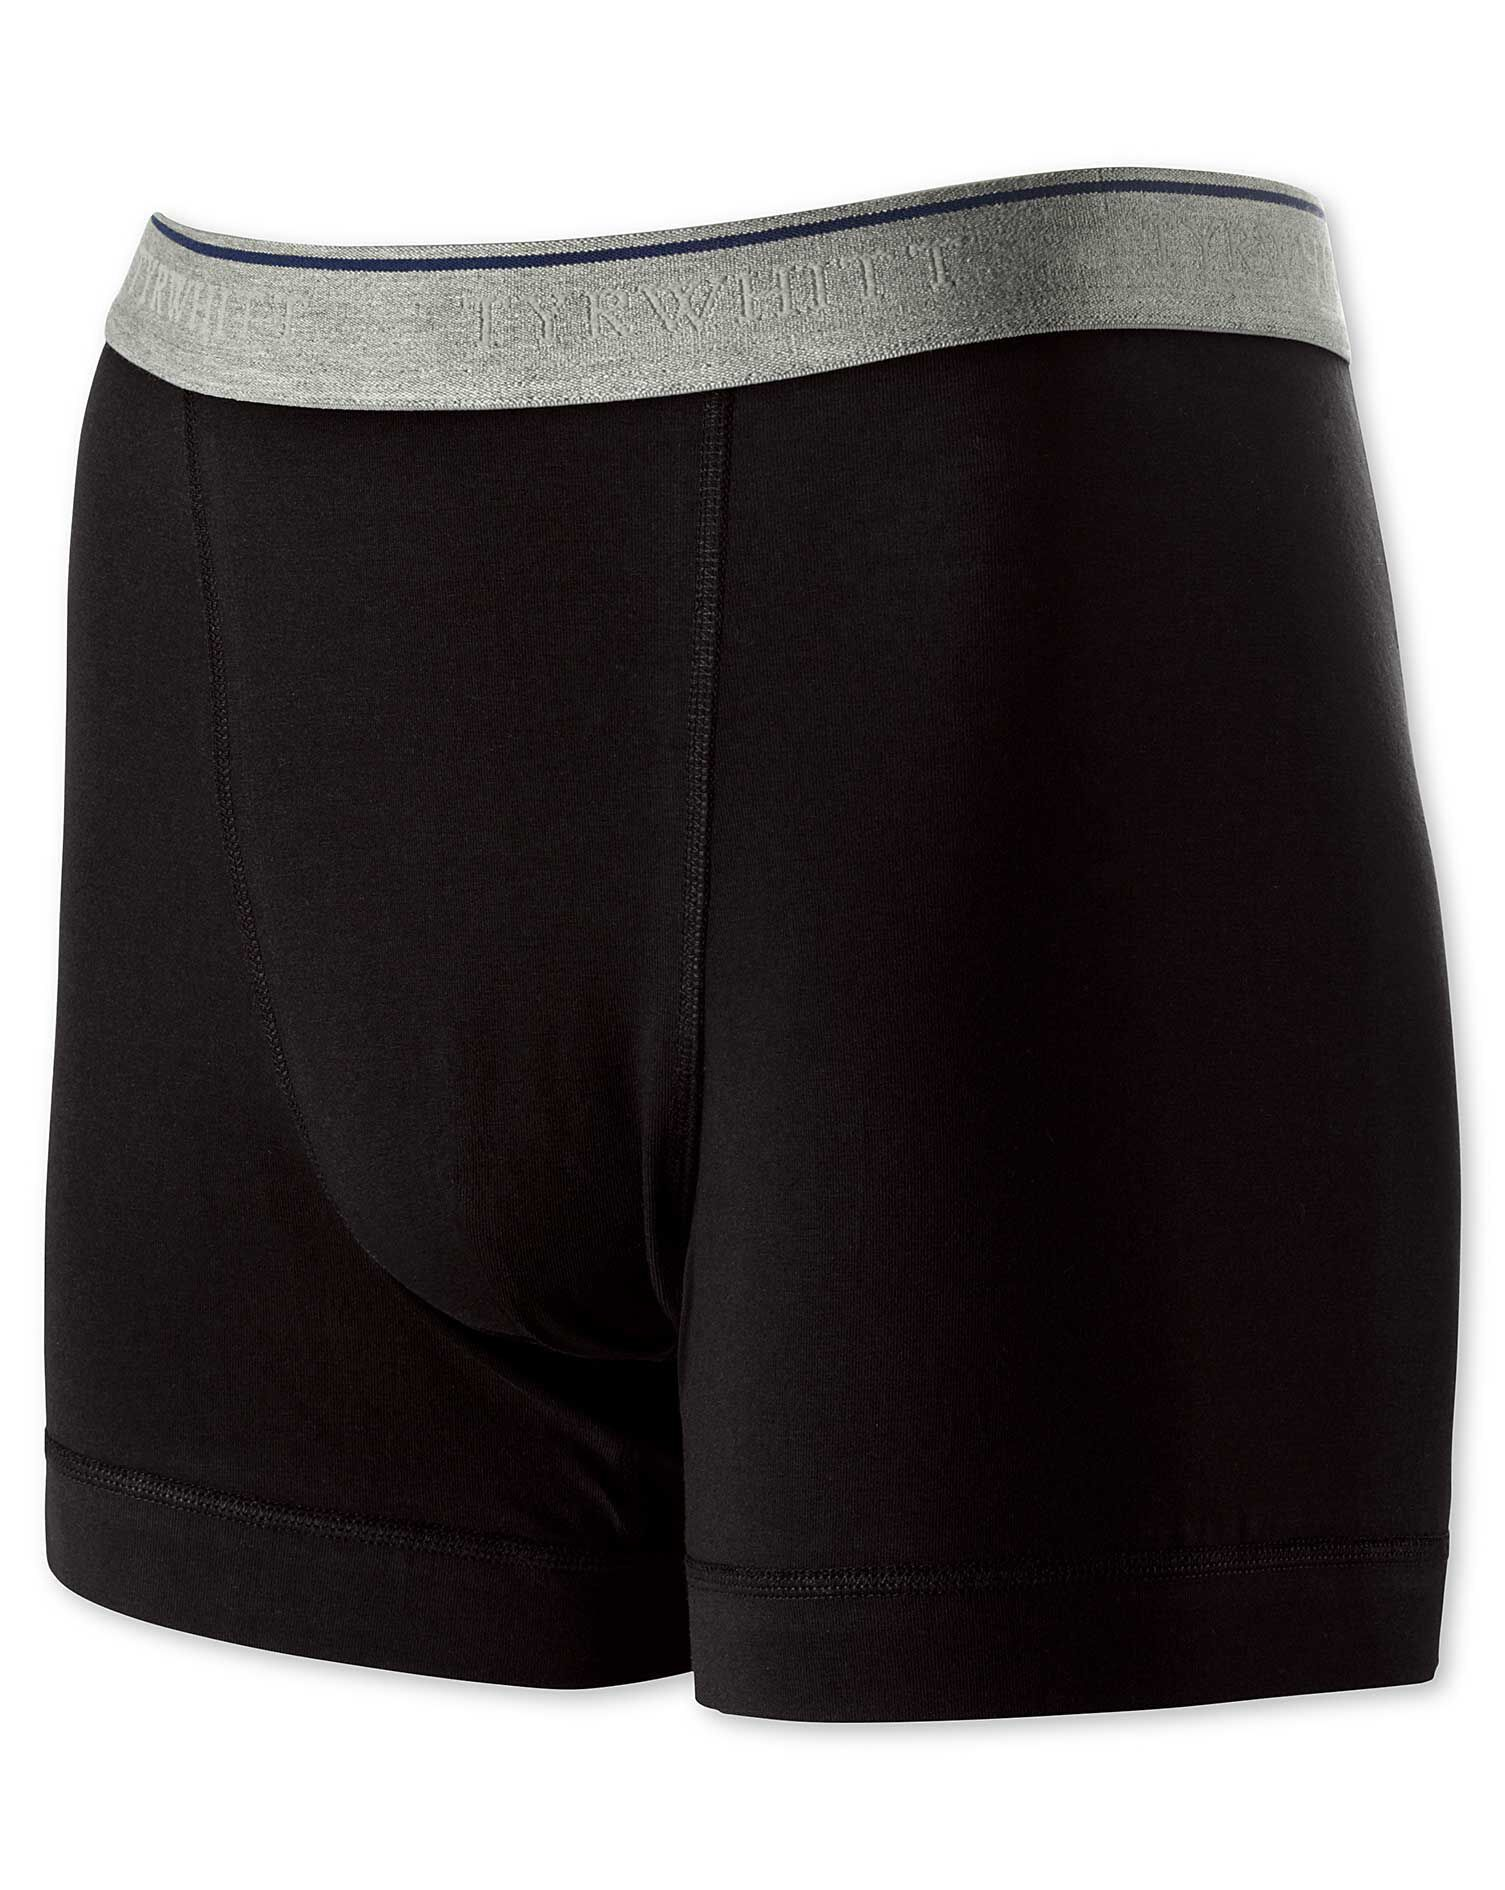 Black Jersey Trunks Size XL by Charles Tyrwhitt